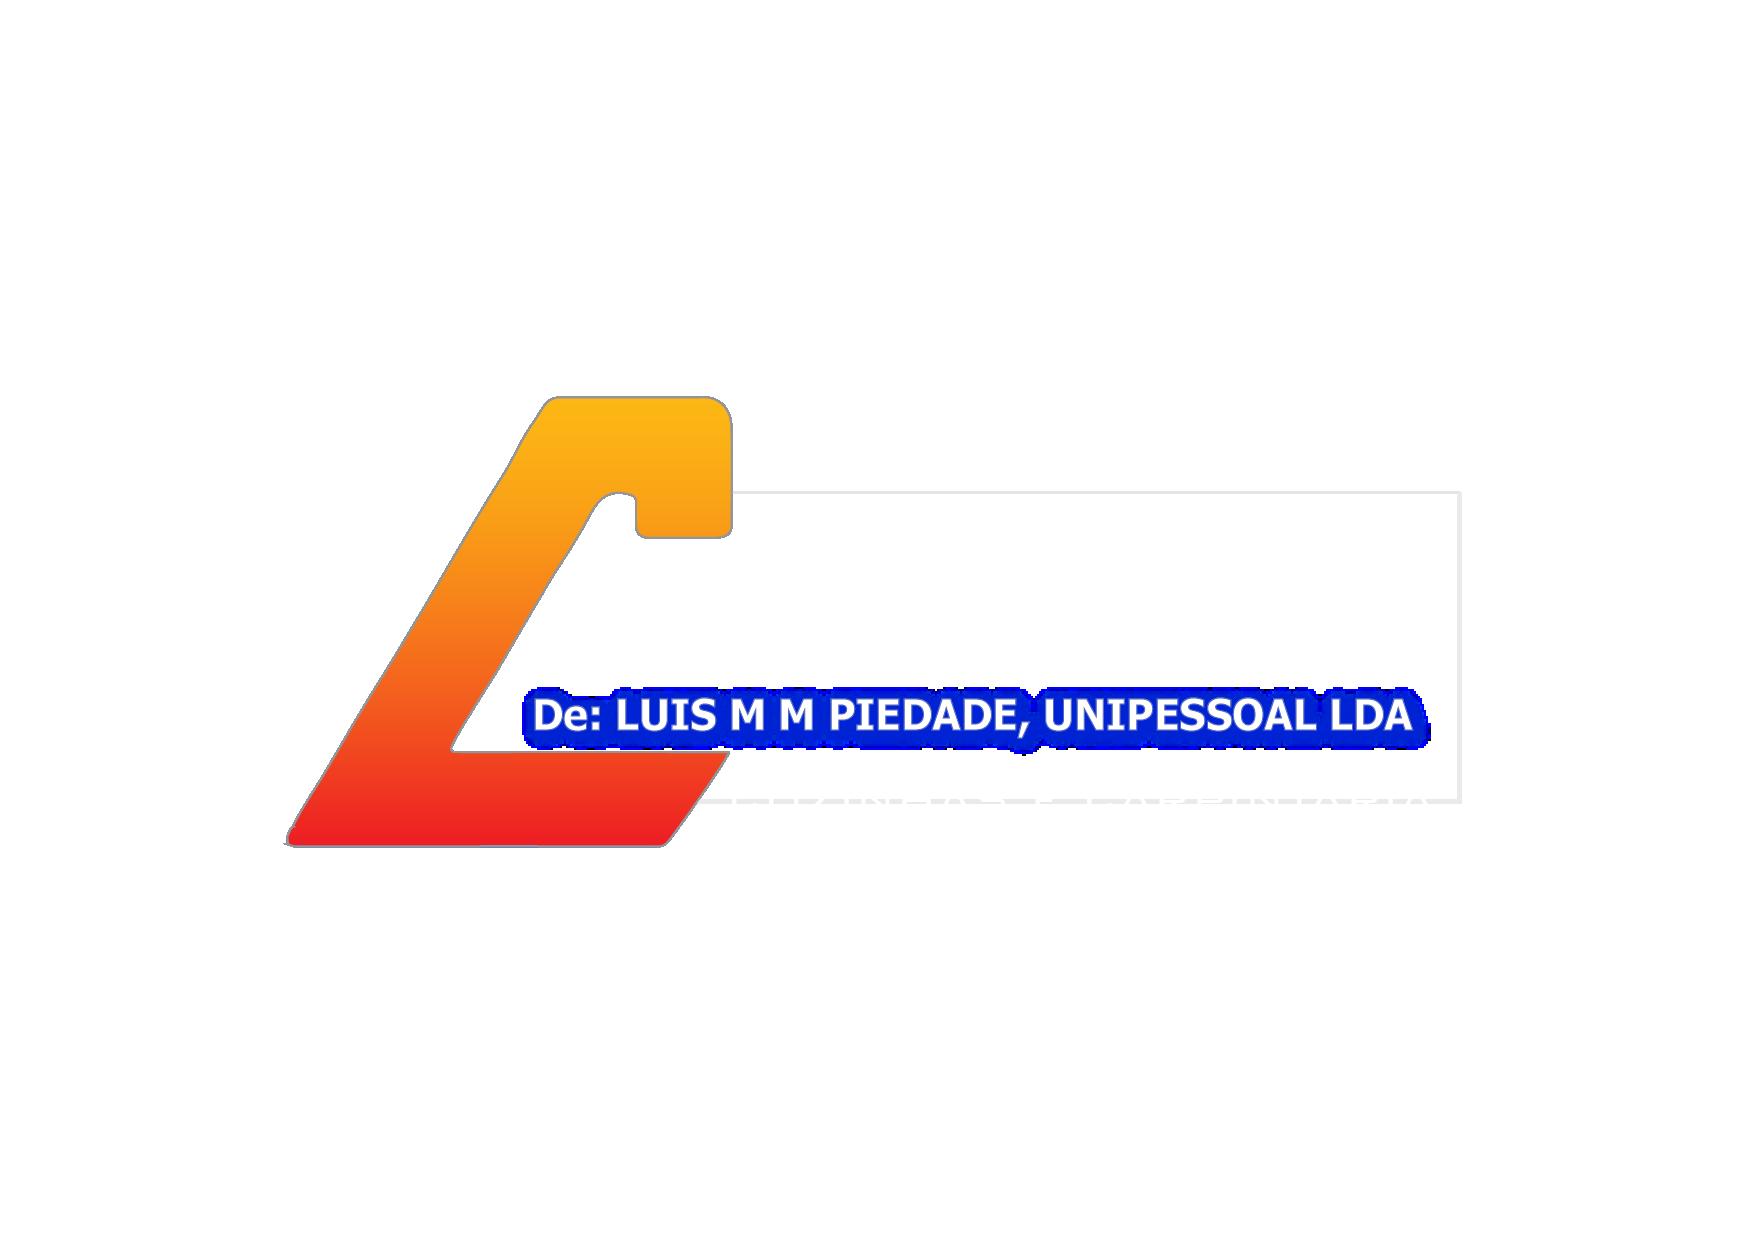 Cozicarp